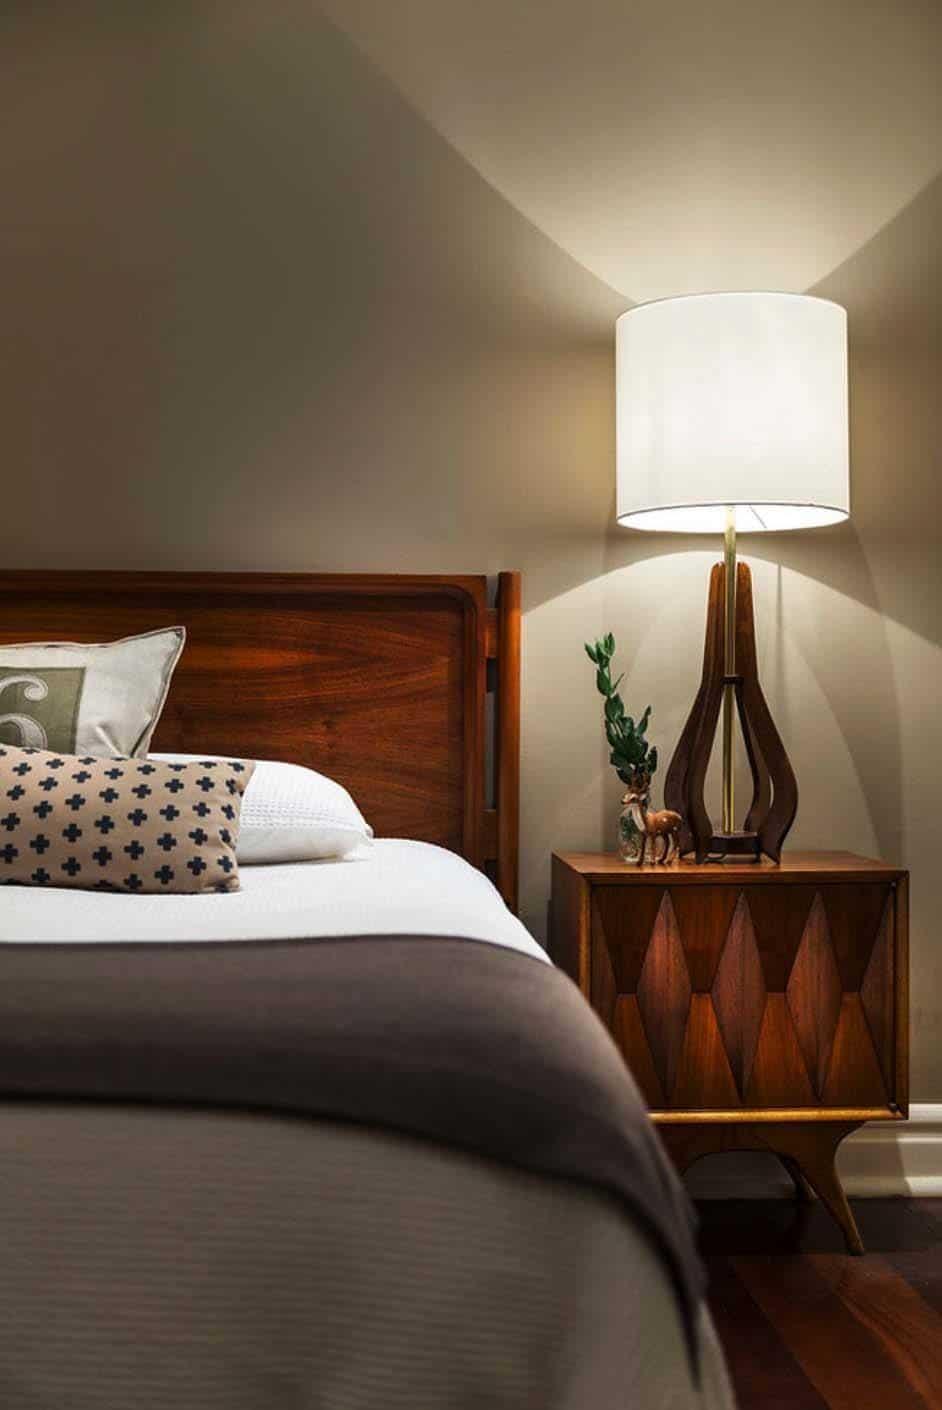 modern bedroom images 35 wonderfully stylish mid century modern bedrooms 12487 | Mid Century Modern Bedroom 15 1 Kindesign